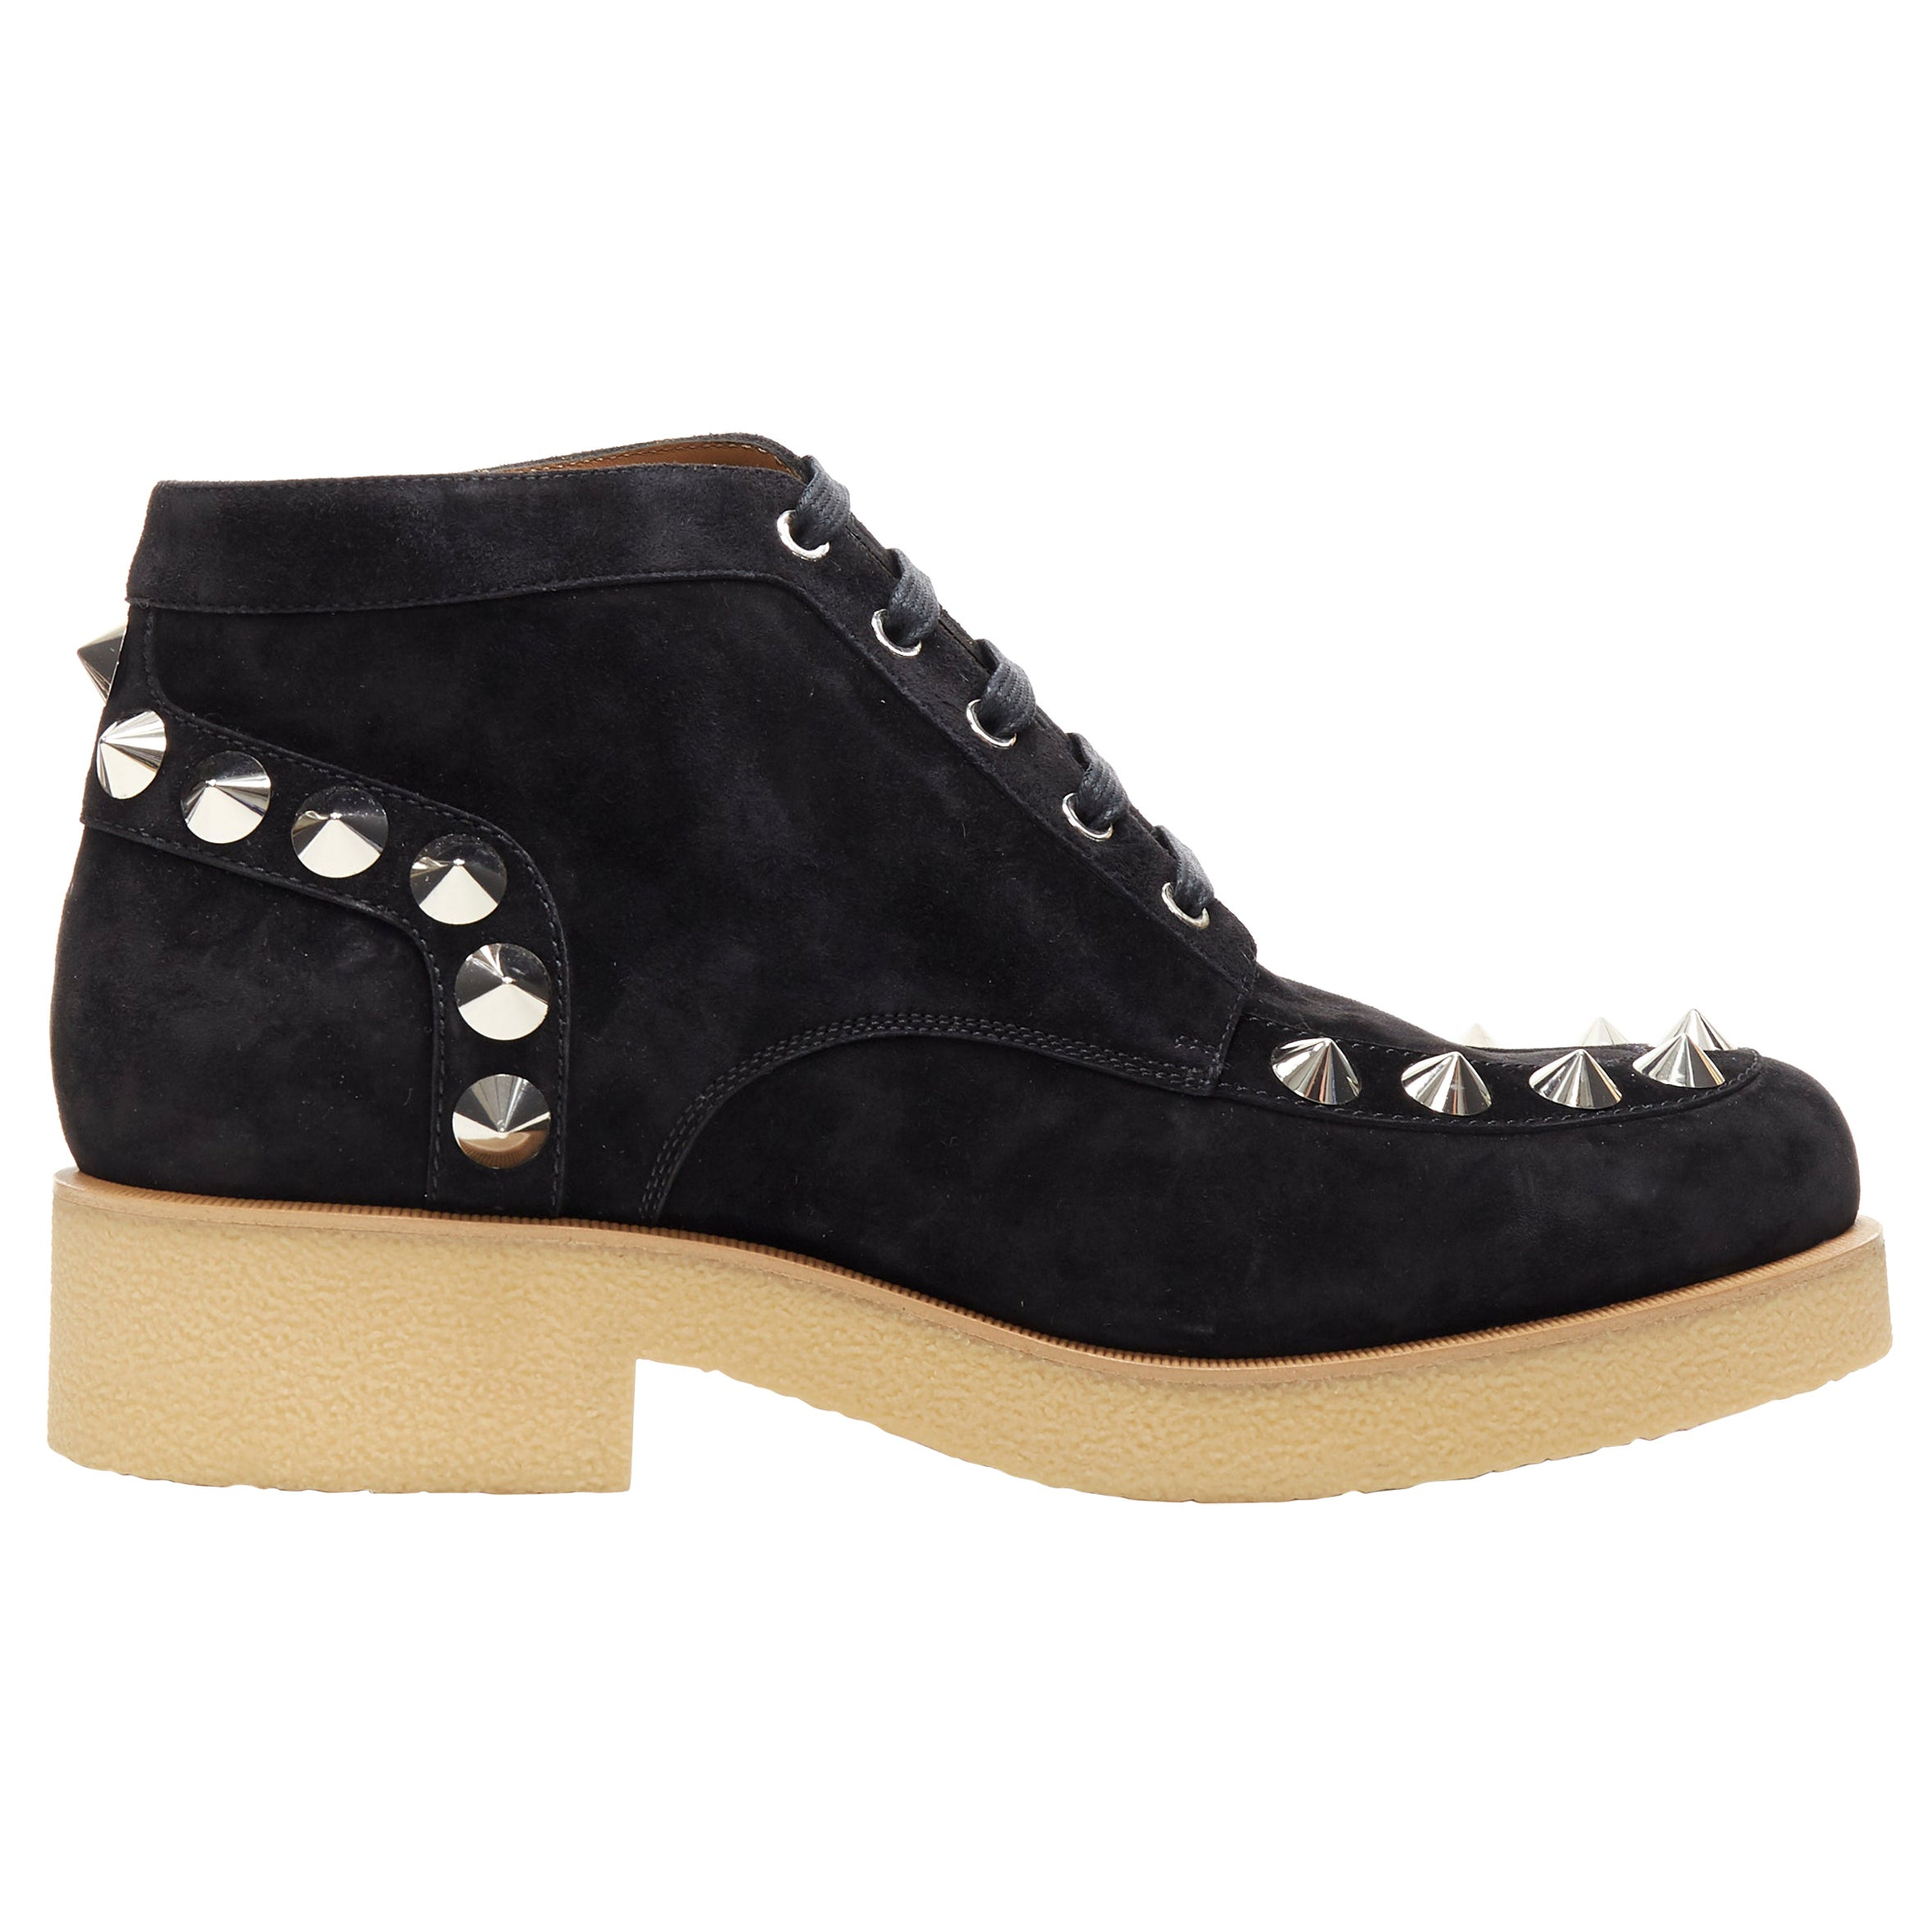 new CHRISTIAN LOUBOUTIN Yannick Flat black suede spike stud creeper boots EU44